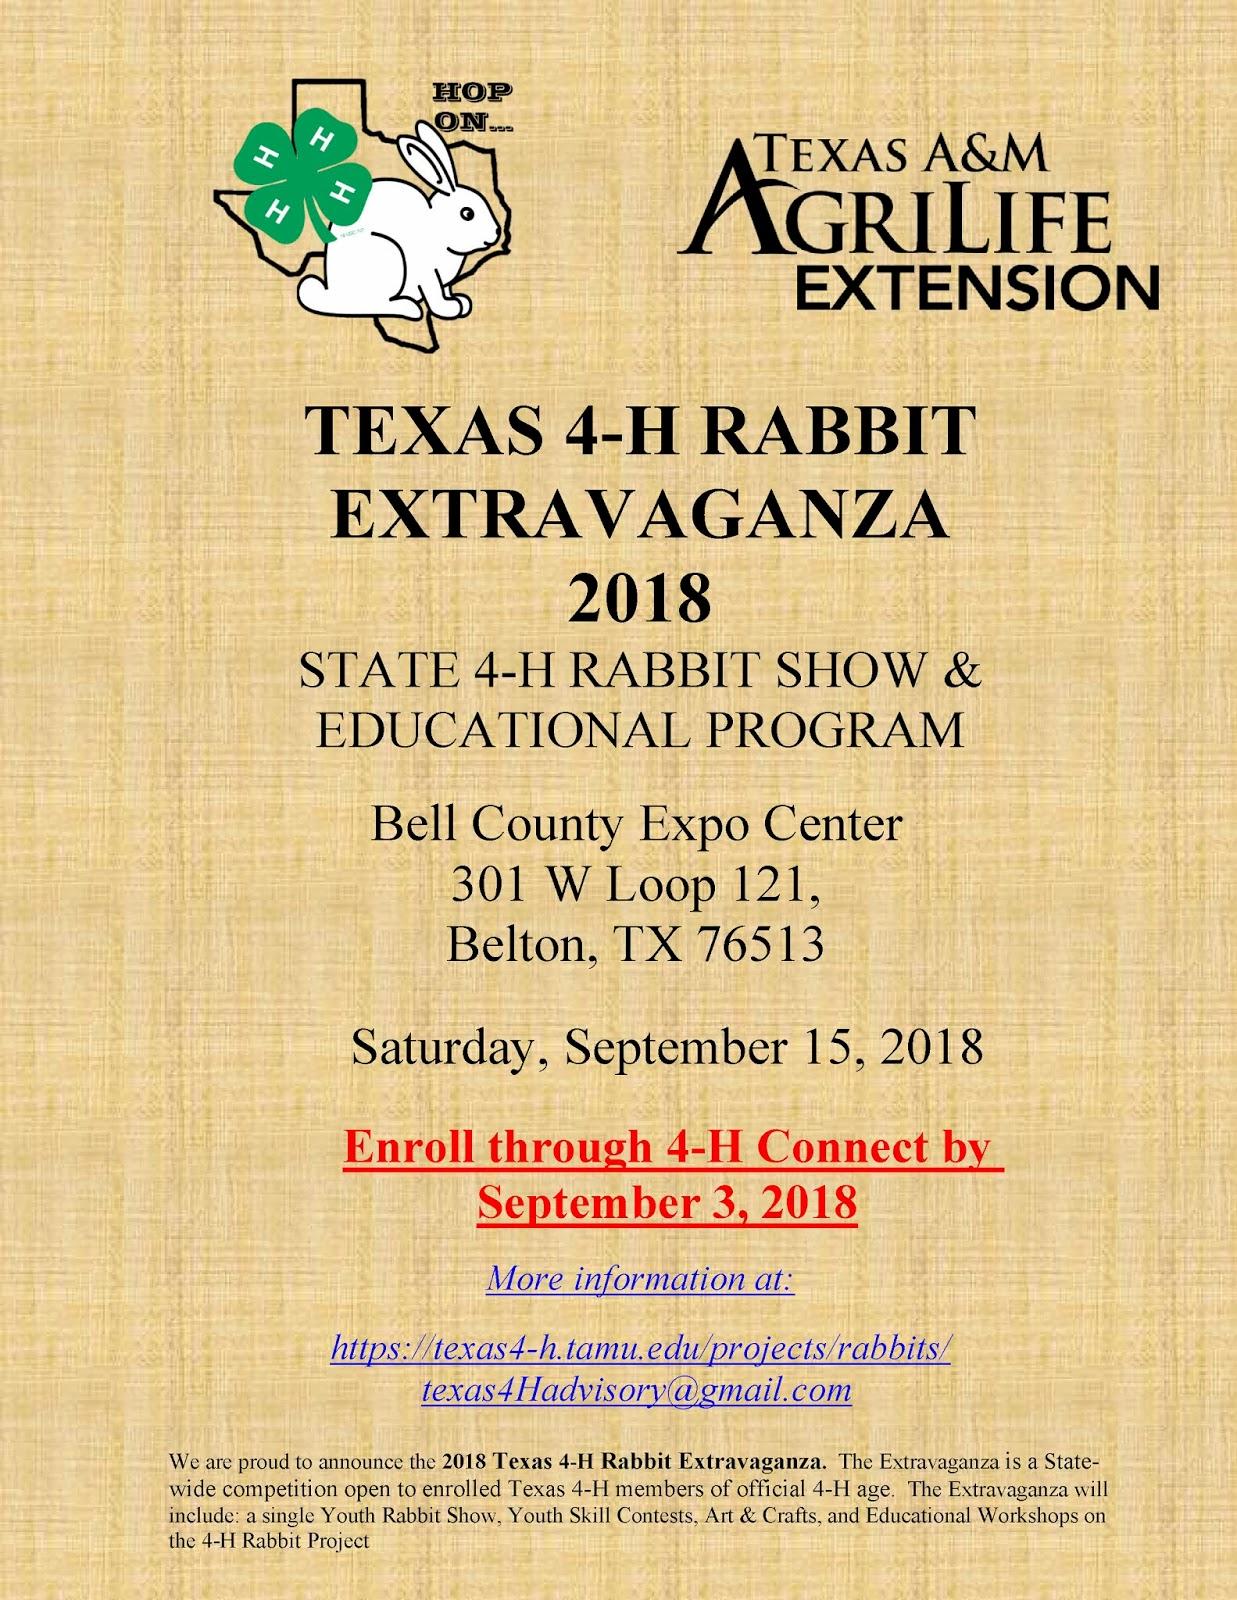 Texas 4-H Rabbit Extravaganza | Texas 4-H Practitioner's Blog